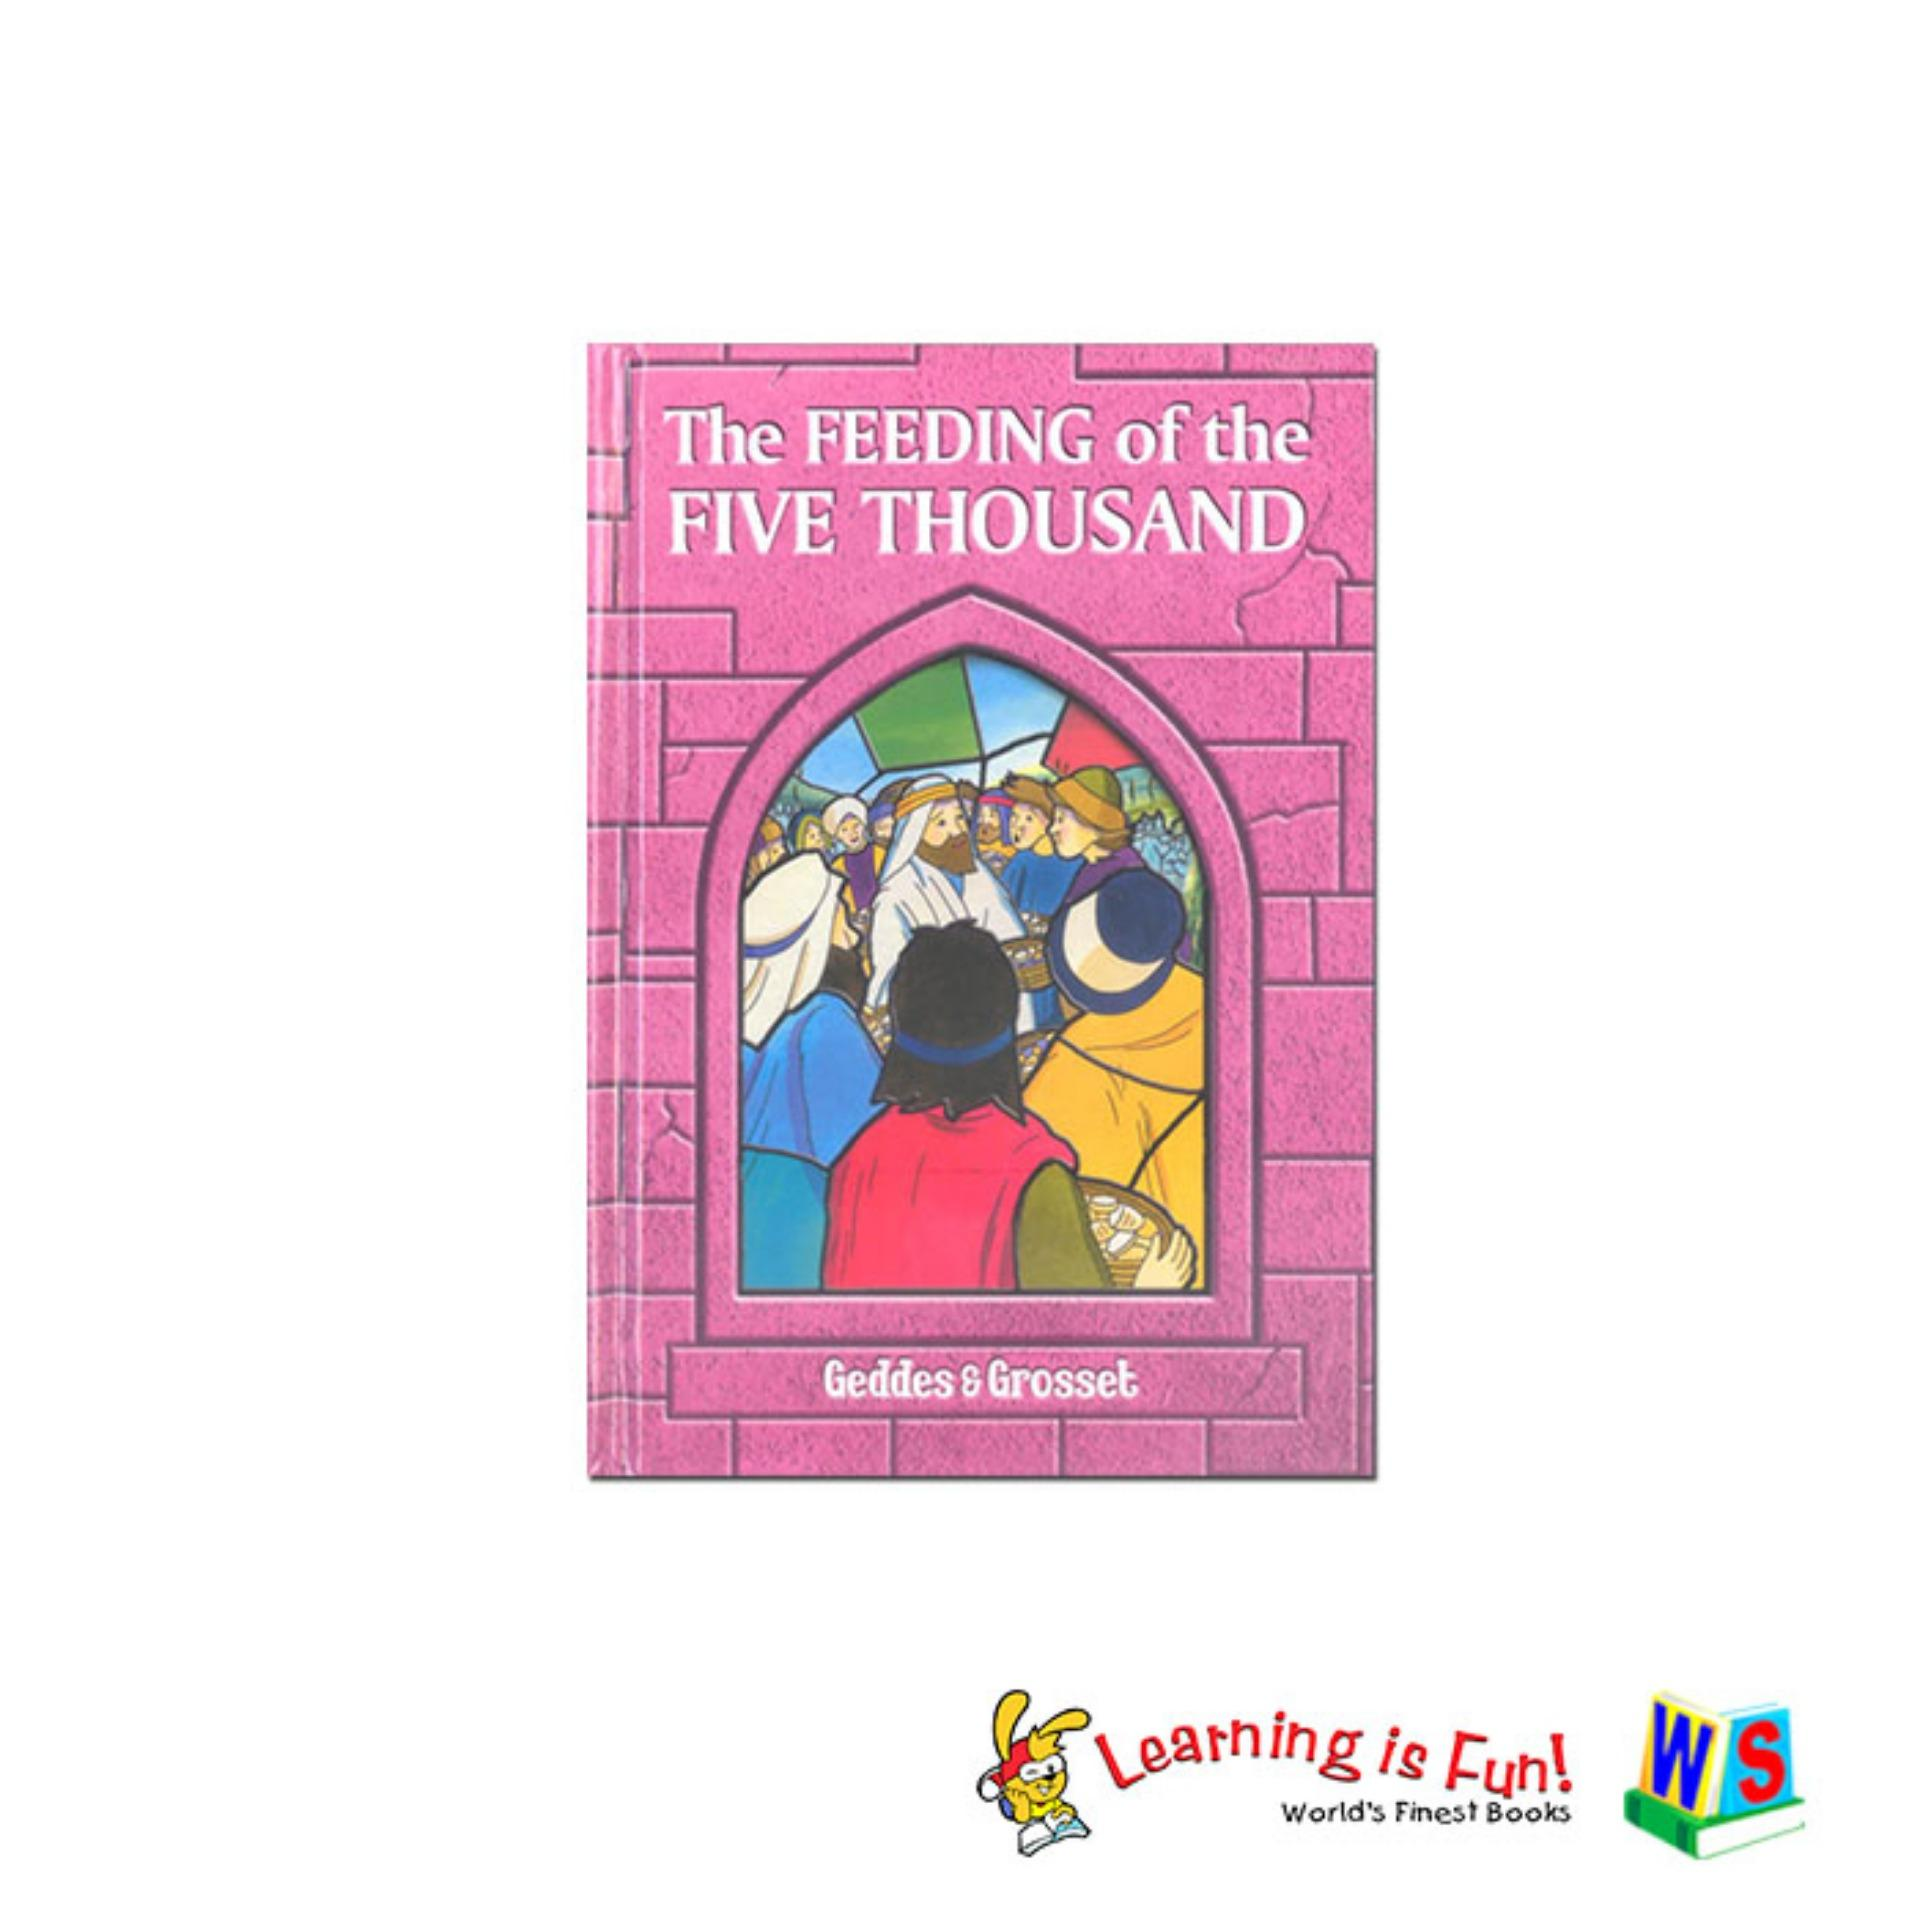 English Children Books for sale - Childrens Activity Books best ...